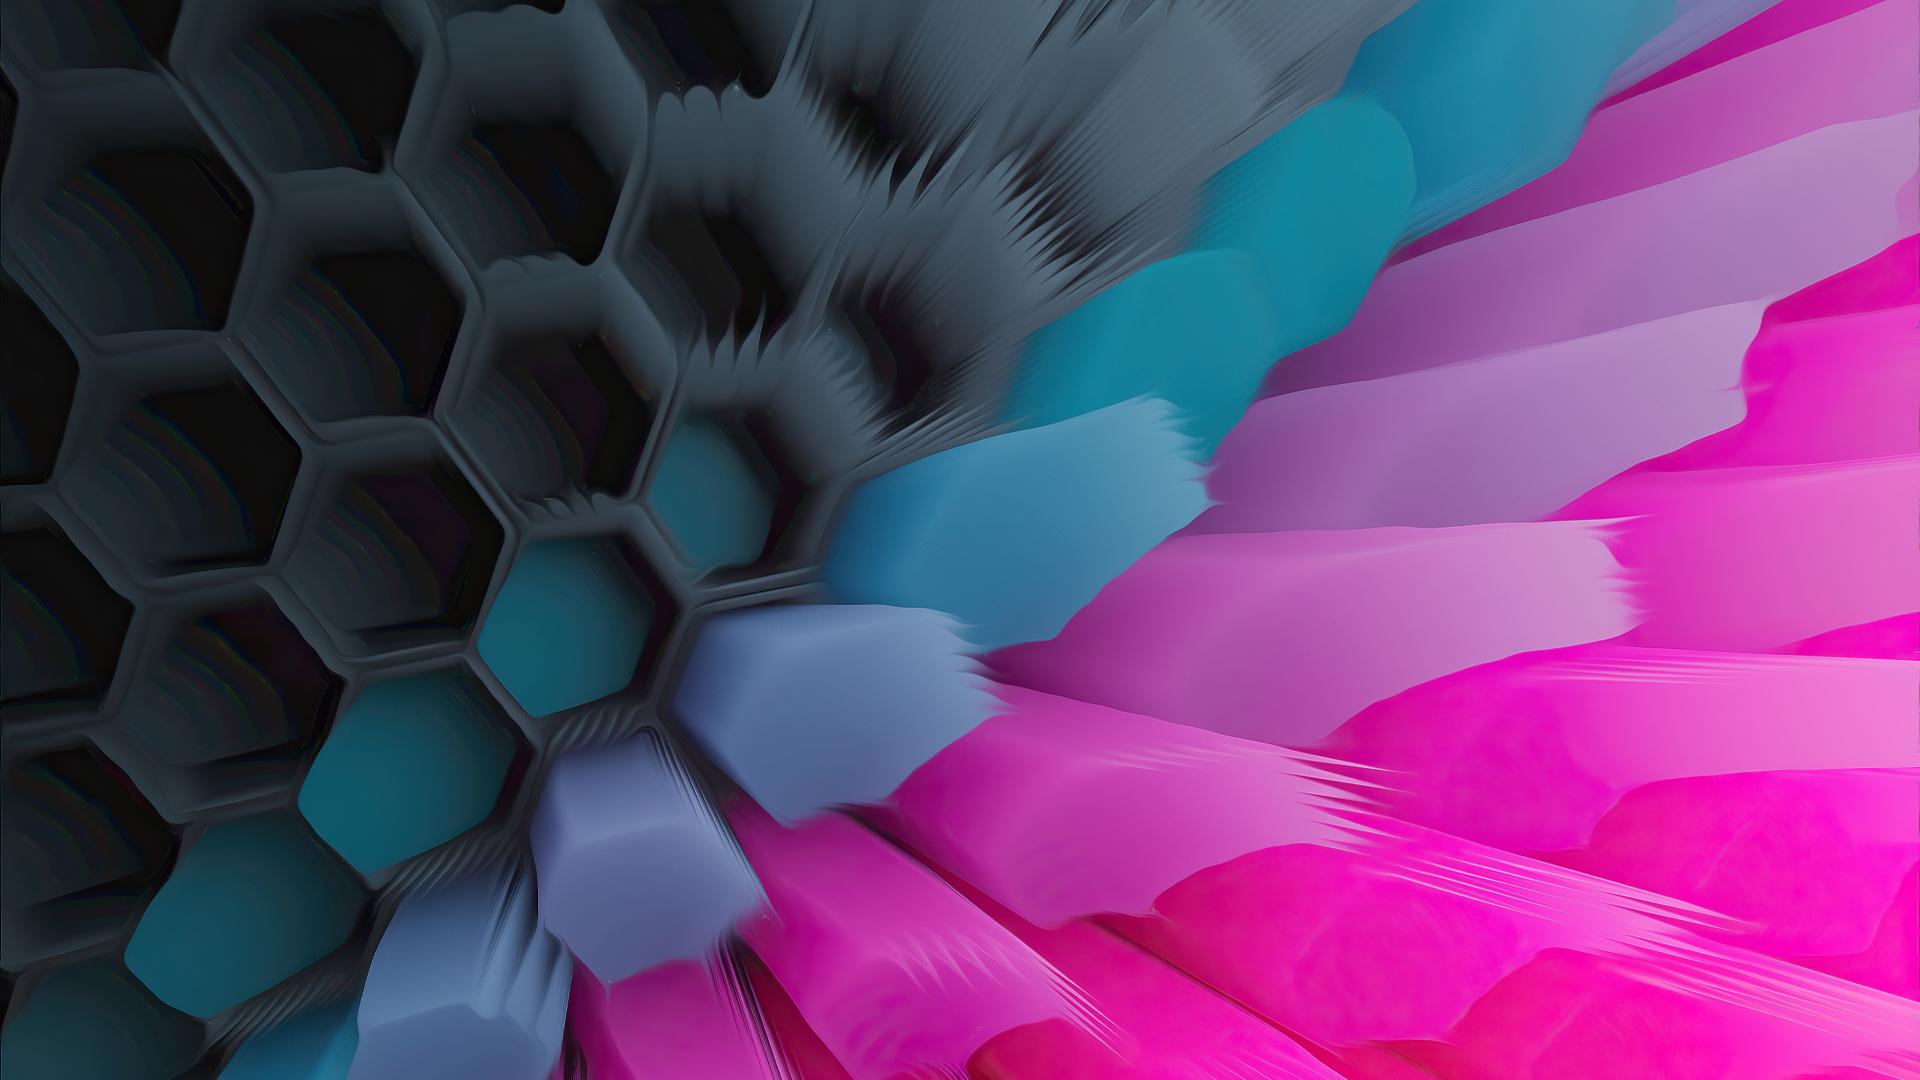 Pink Blue 4K Hexagon Wallpaper in 1920x1080 Resolution